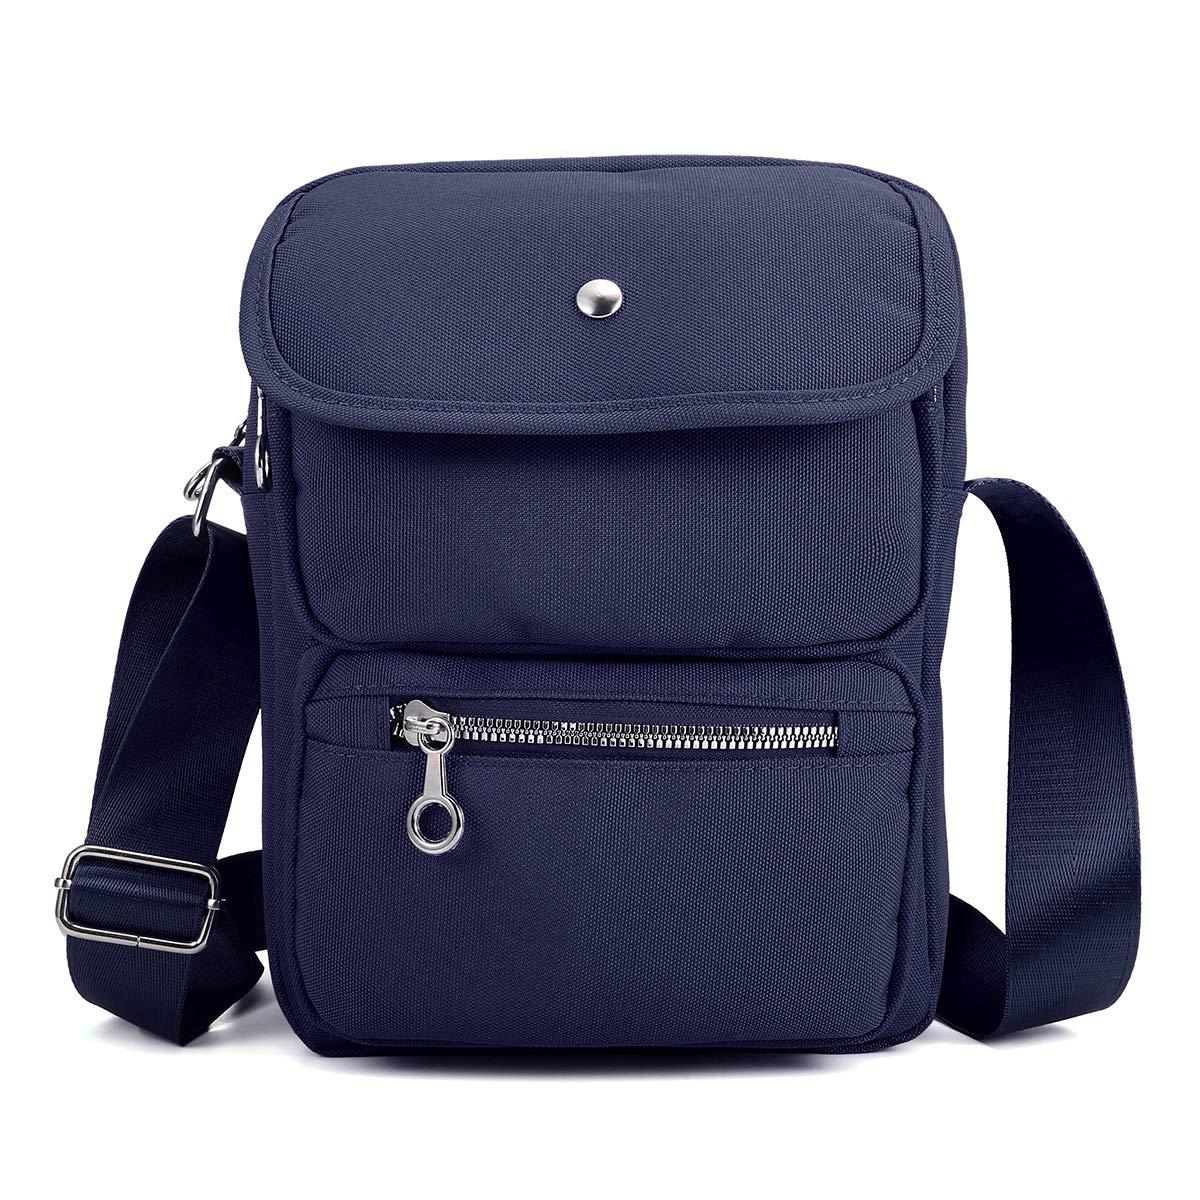 Nylon Shoulder Bag for Women, JOSEKO Multi-Pocketed Crossbody Purse Wallet Passport Travel Bag Messenger Bag Black